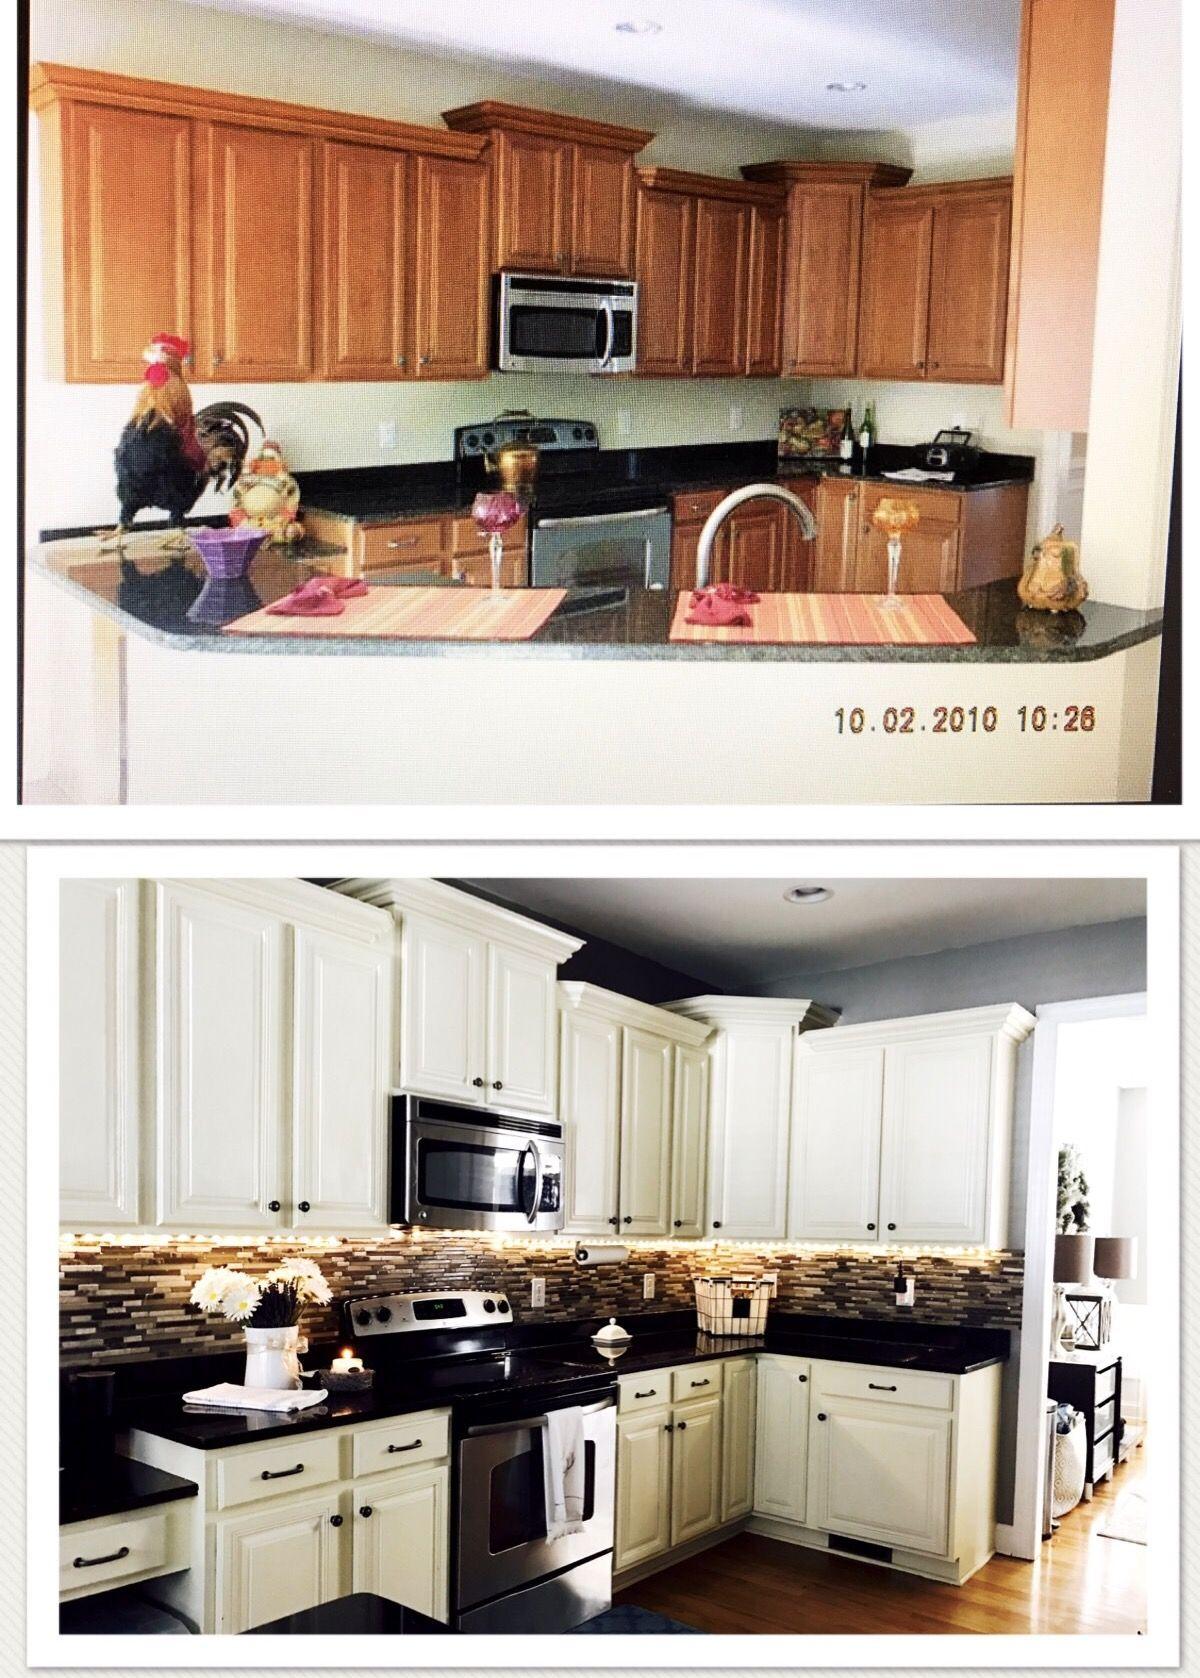 Annie Sloan Chalk Paint Old White To Paint Kitchen Cabinets Kitchen Design Dining Furniture Makeover Kitchen Cabinets